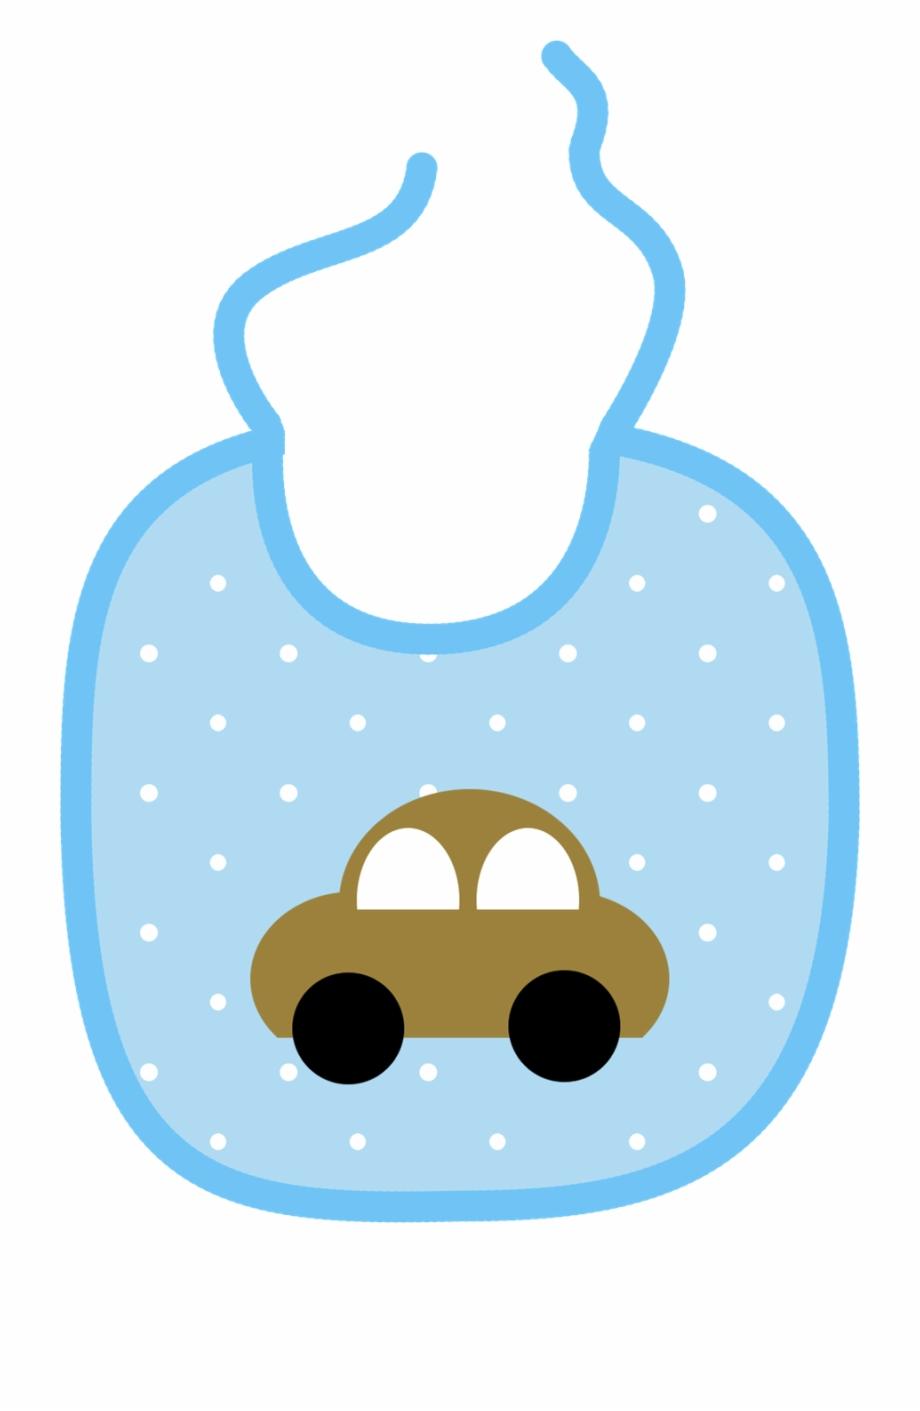 Baby bib clipart vector royalty free download Freeuse Stock Baby In Blanket Clipart - Bib Clipart Free PNG Images ... vector royalty free download